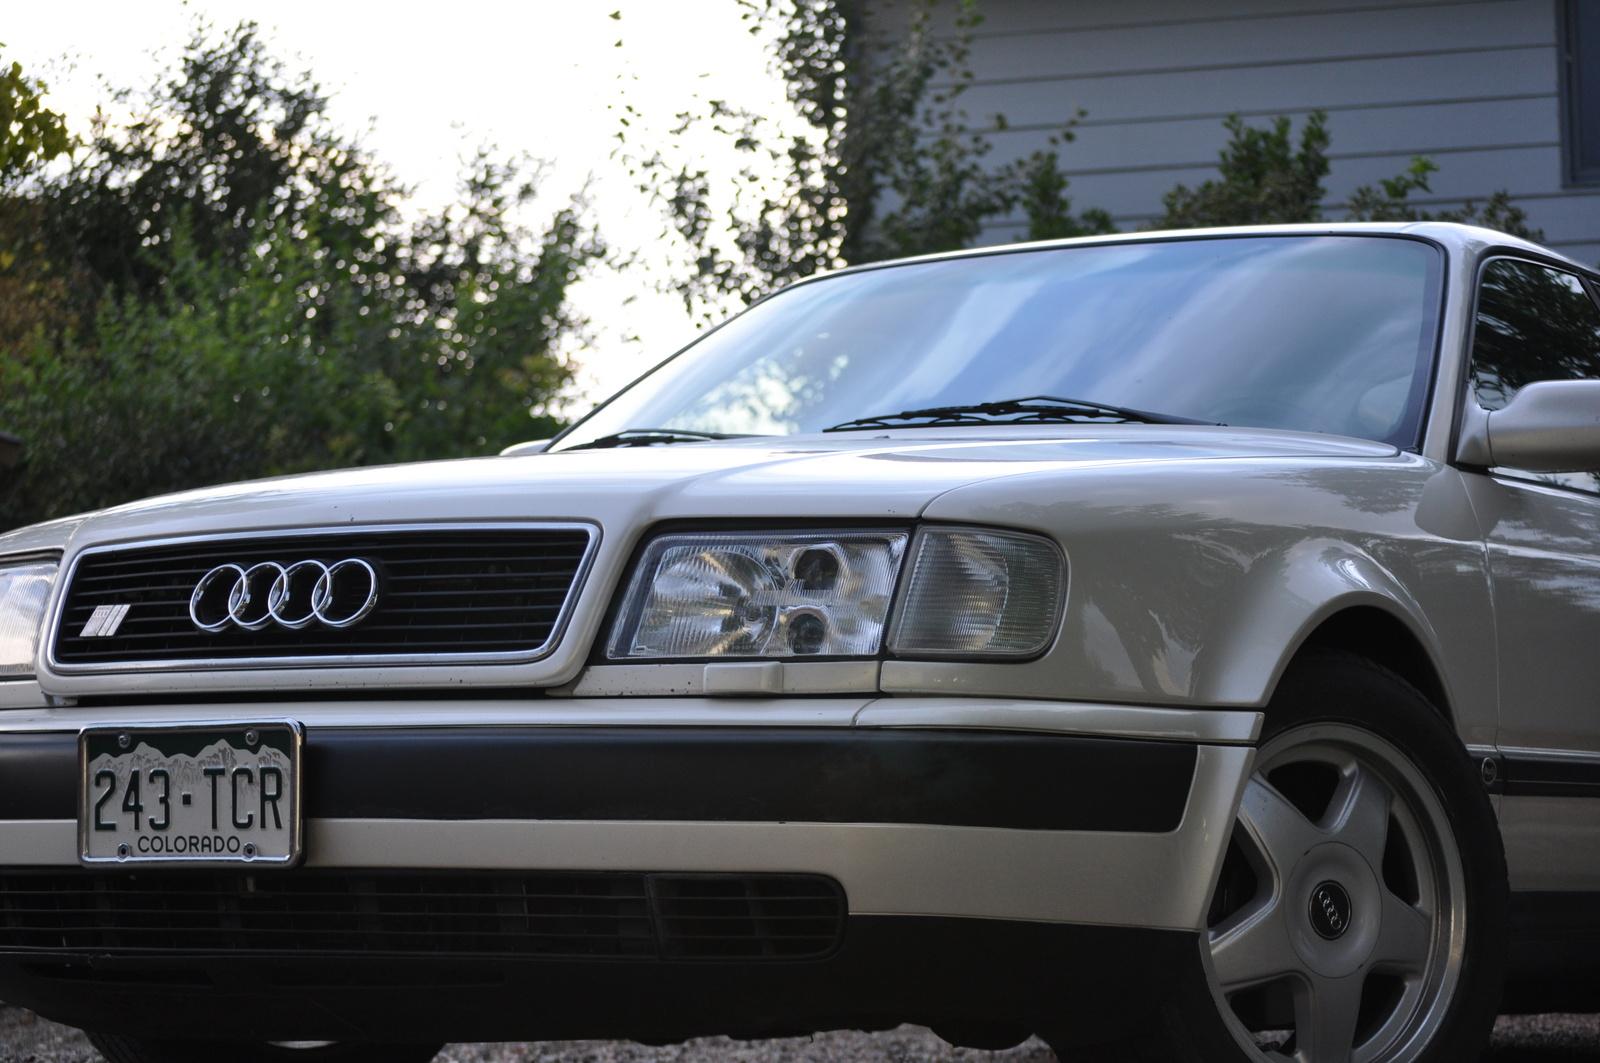 1993 Audi 100 Image 2